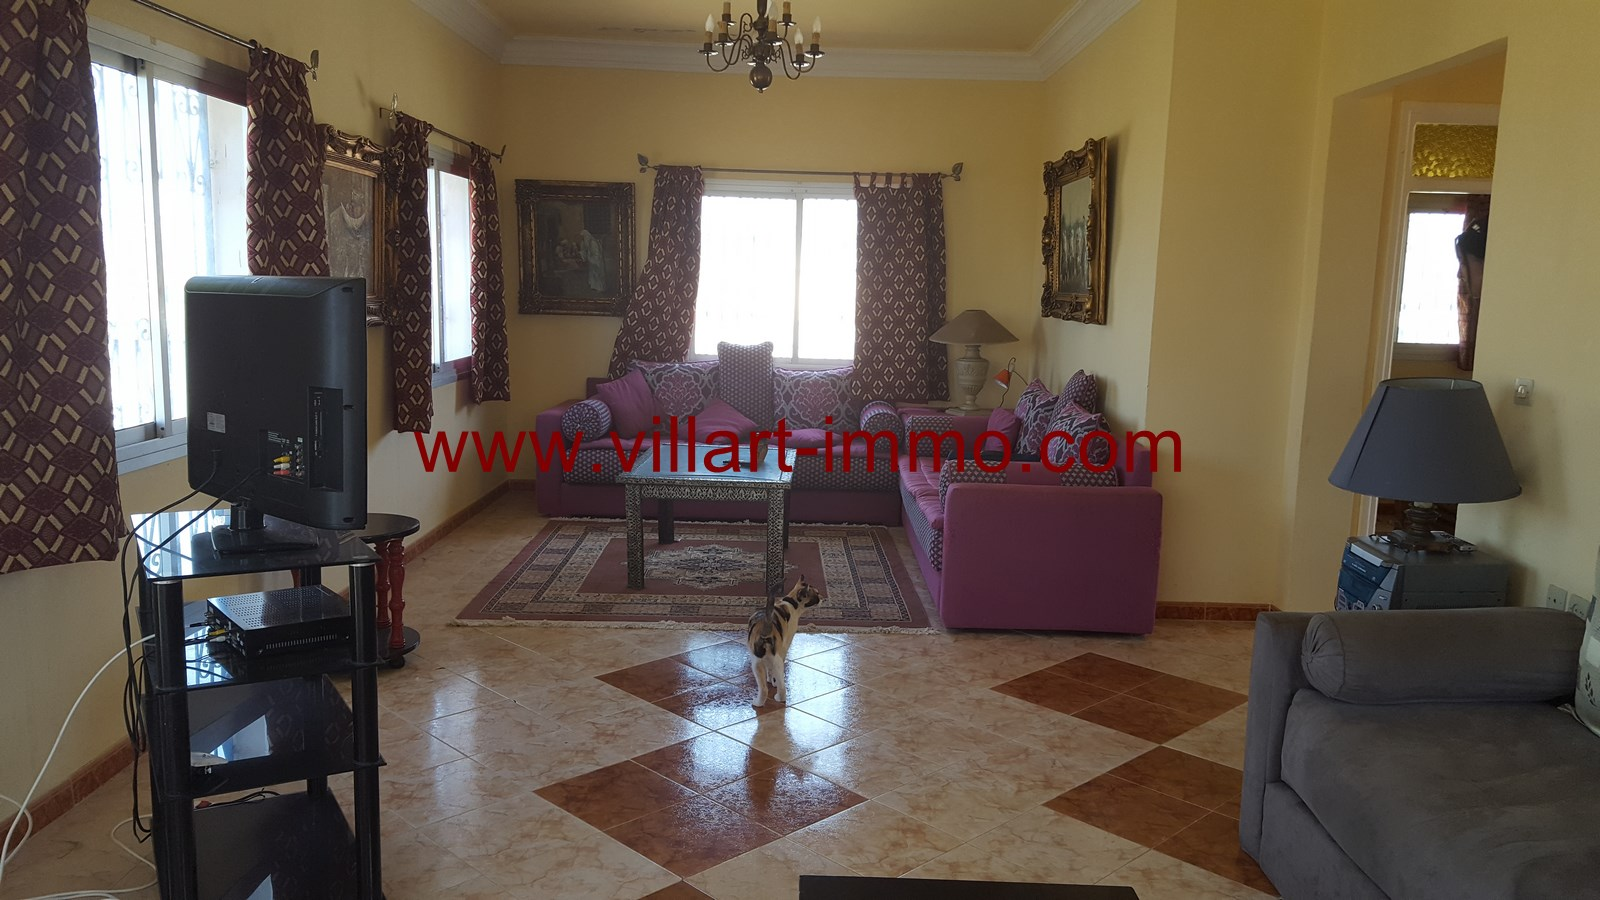 5-a-vendre-tanger-villa-salon-1-vv427-villart-immo-agence-immobiliere